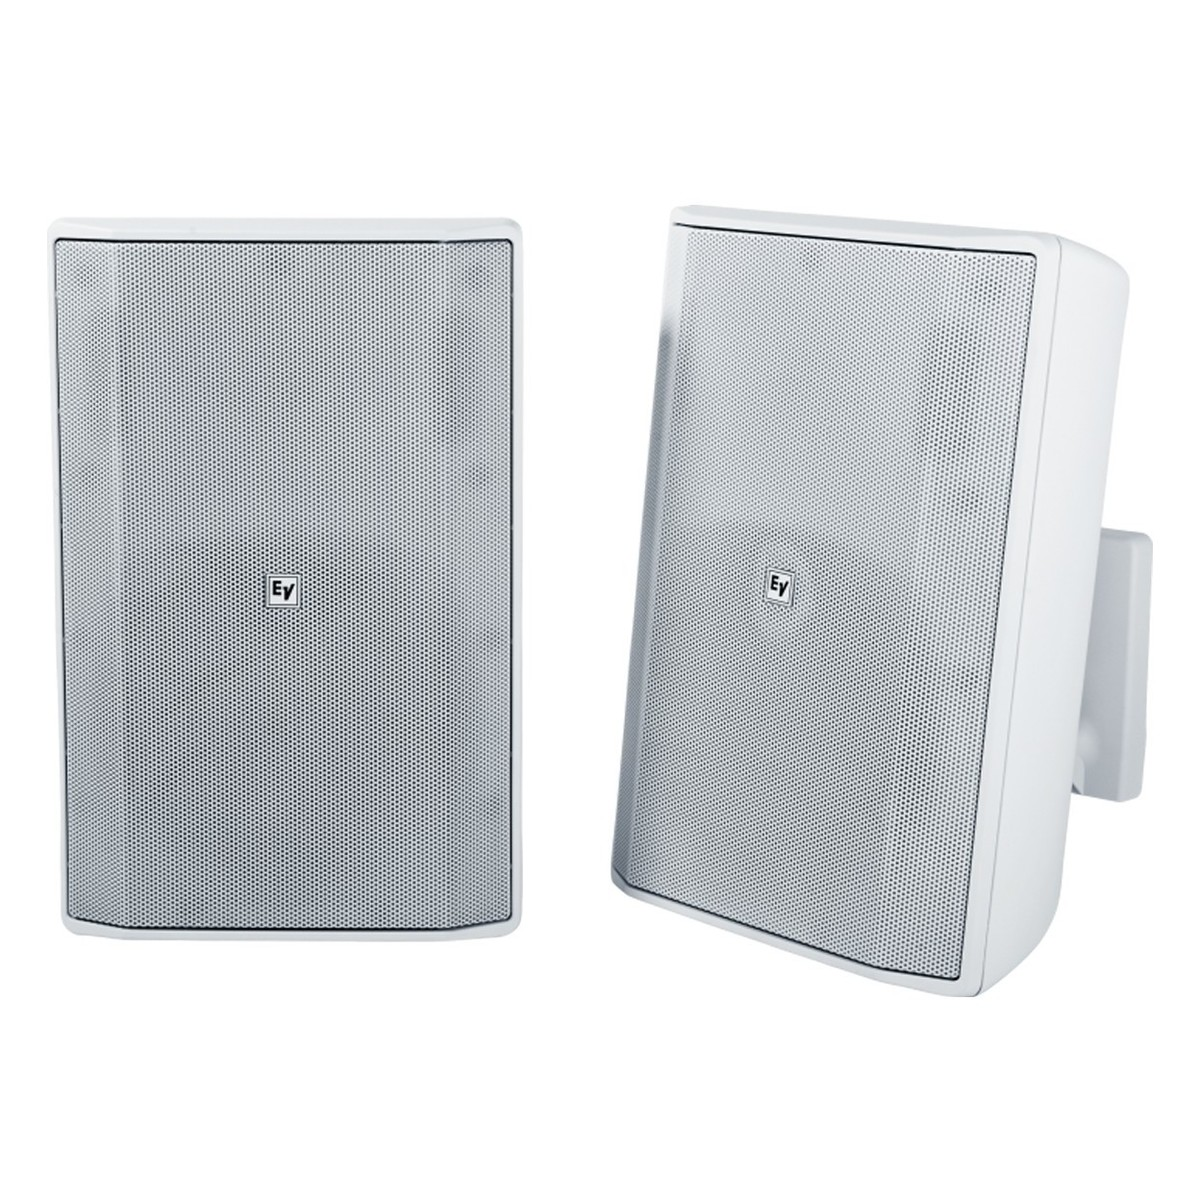 Electro Voice Evid S82 Installation Speakers White Pair